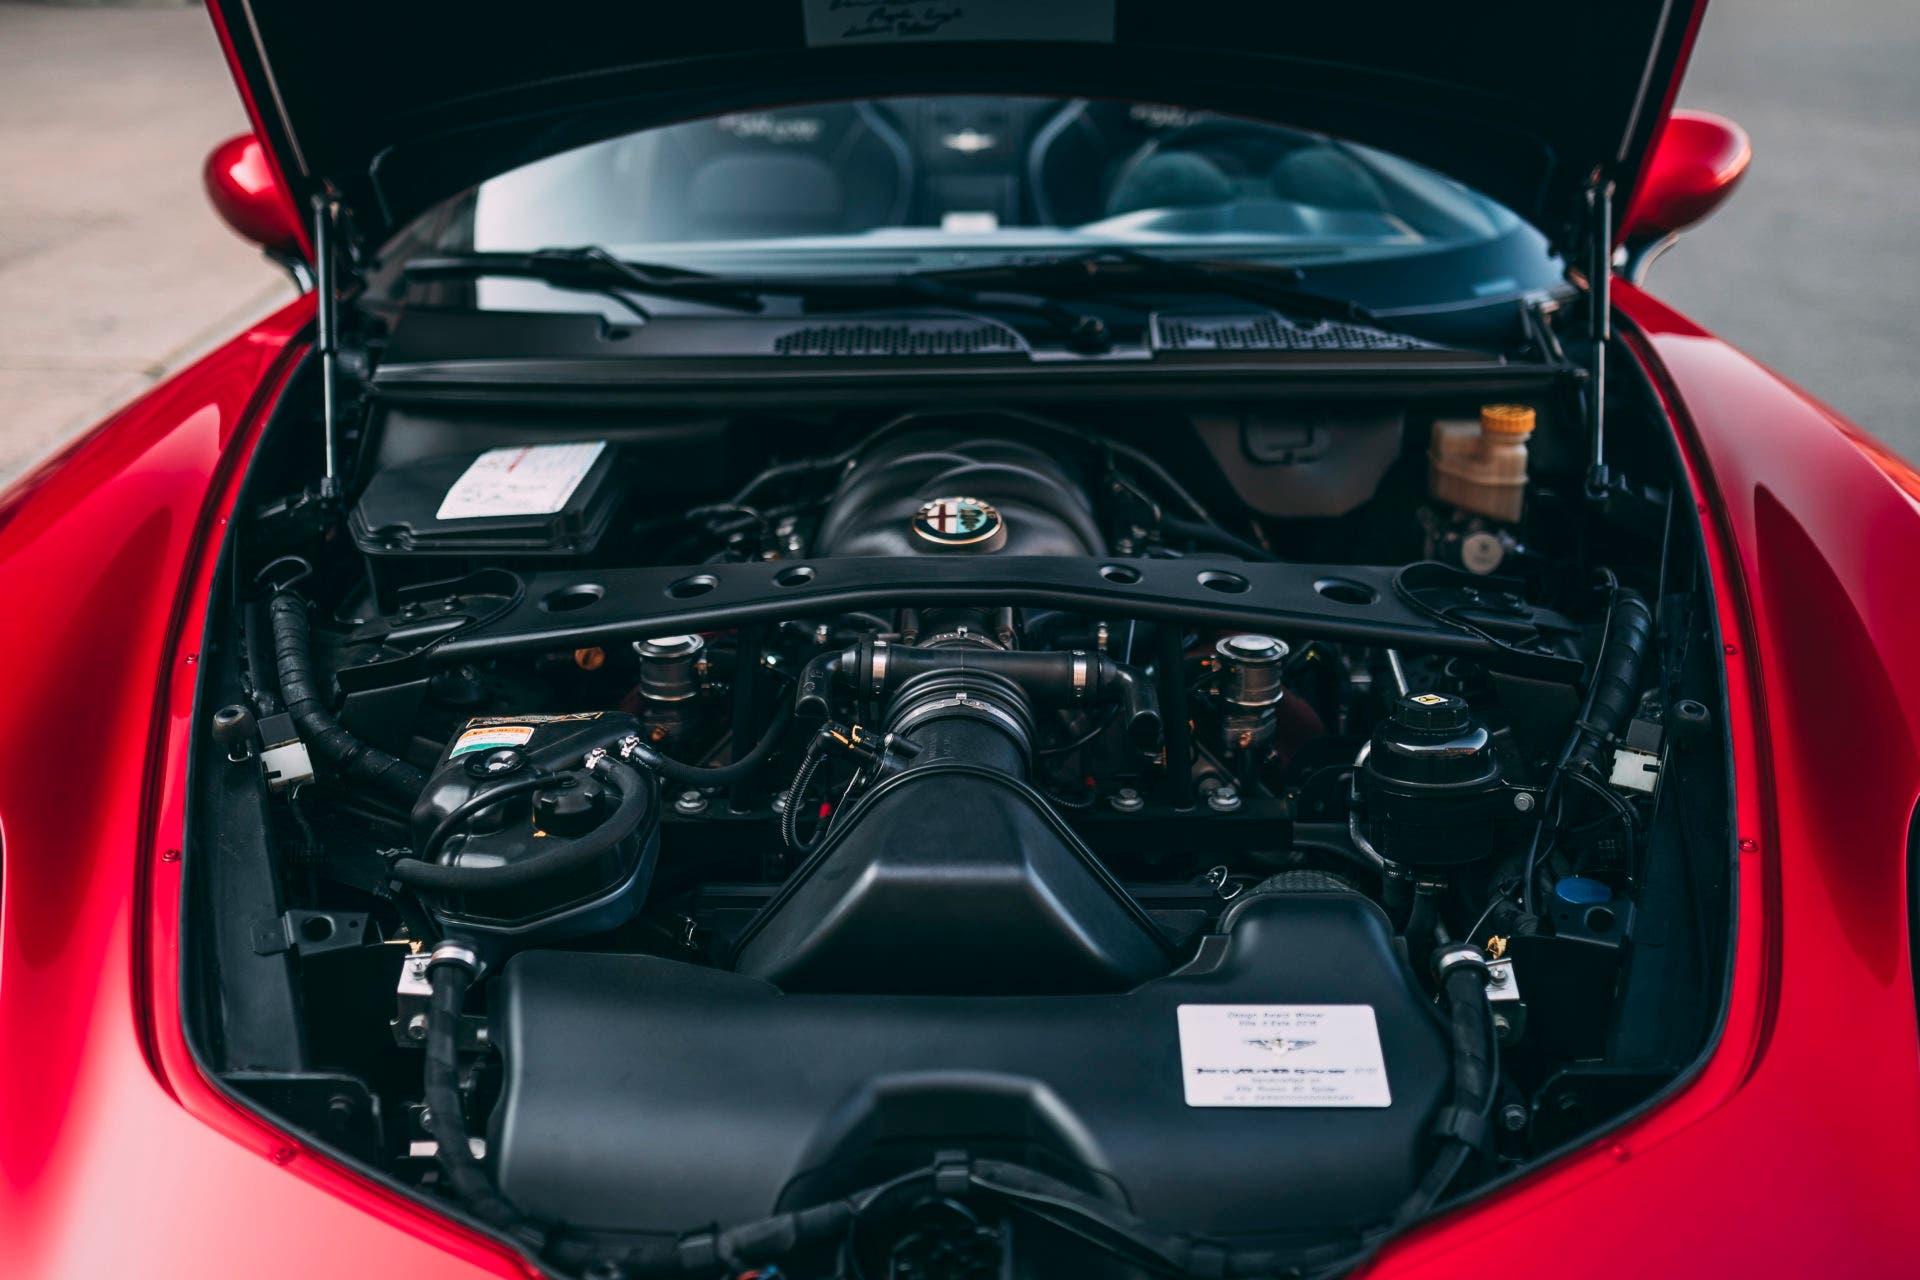 Alfa Romeo Disco Volante Spyder 2017